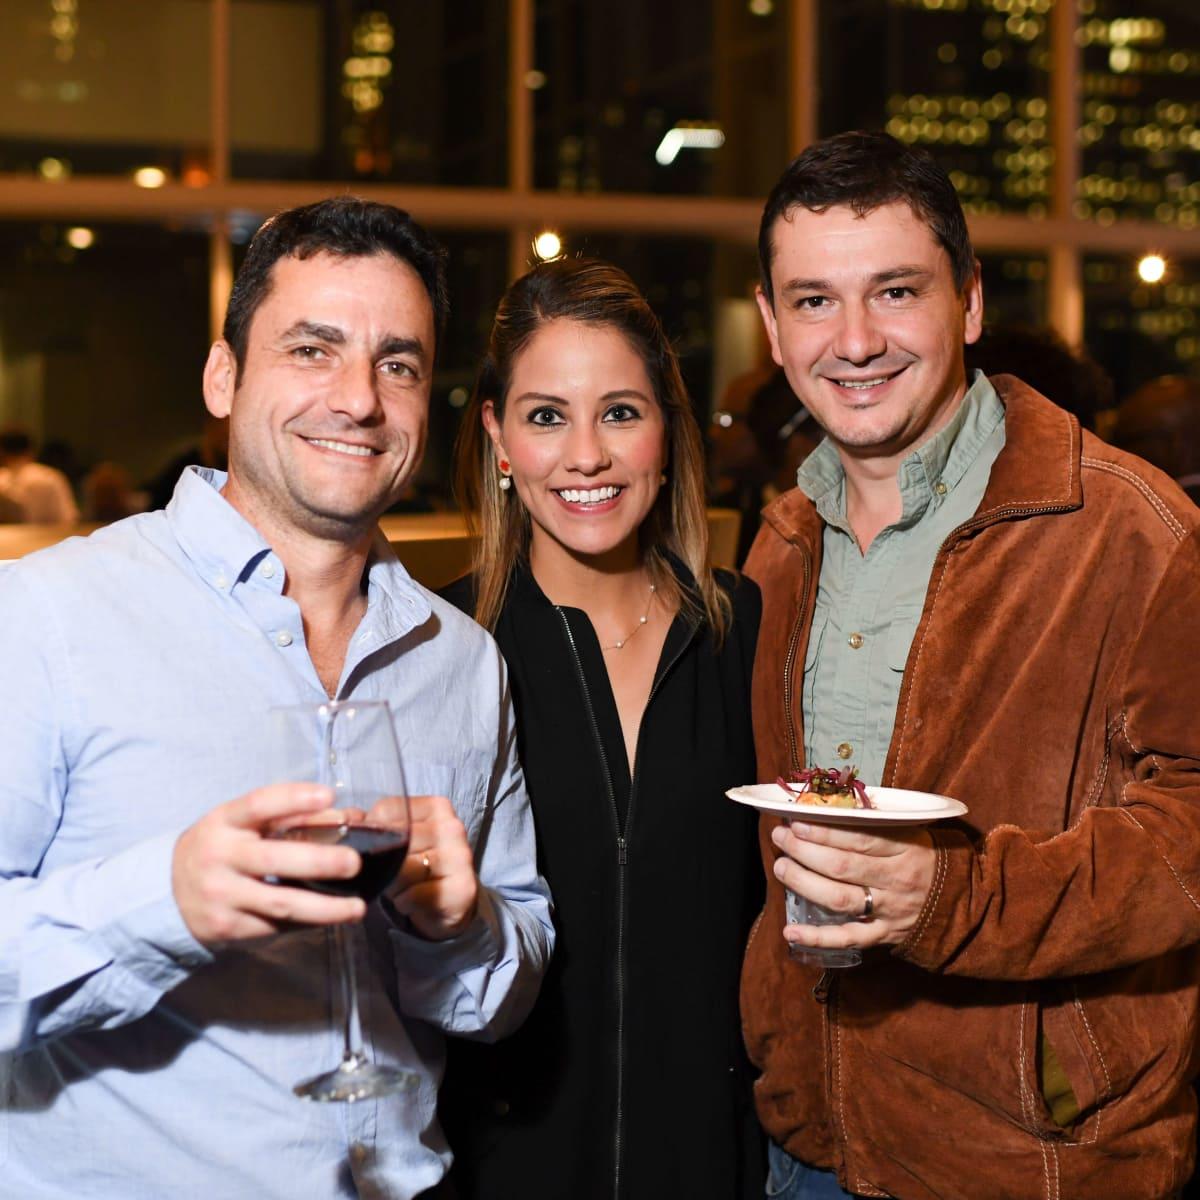 Houston, The Truffle Masters 2017, Jan 2017, Ianir Divinsky, Raquel Franco, Alexis Franco